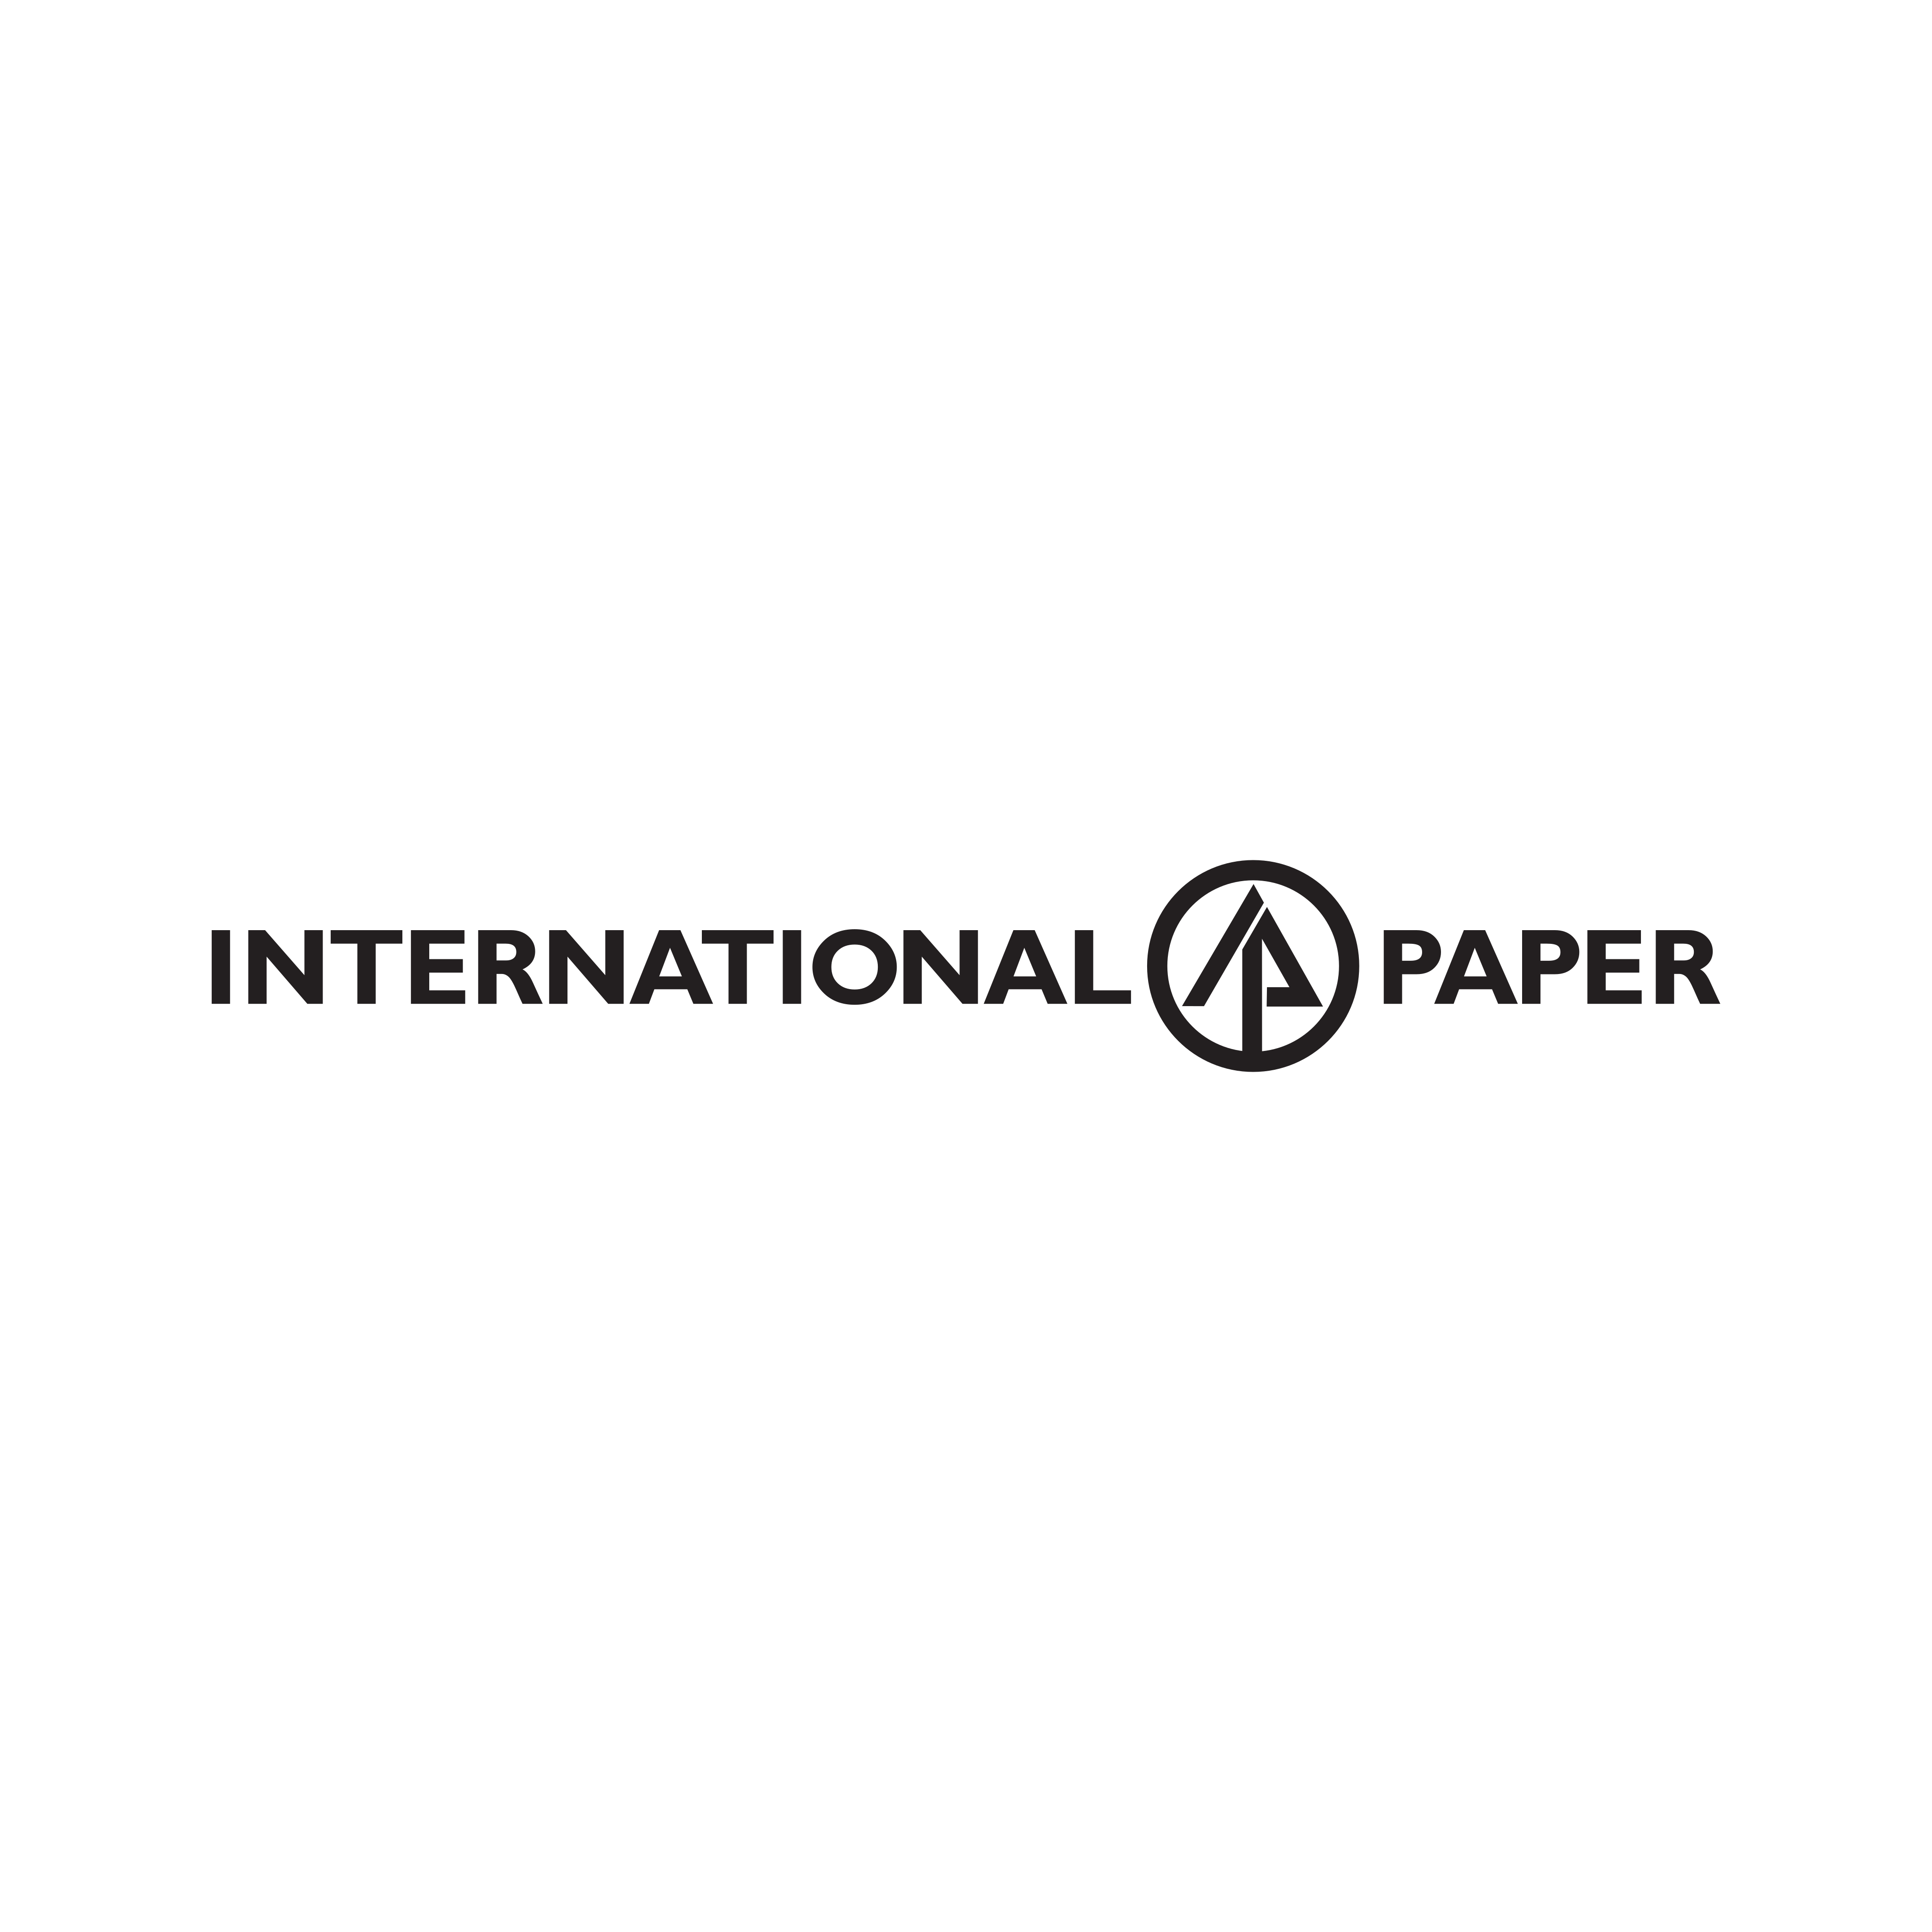 international paper logo 0 - International Paper Logo